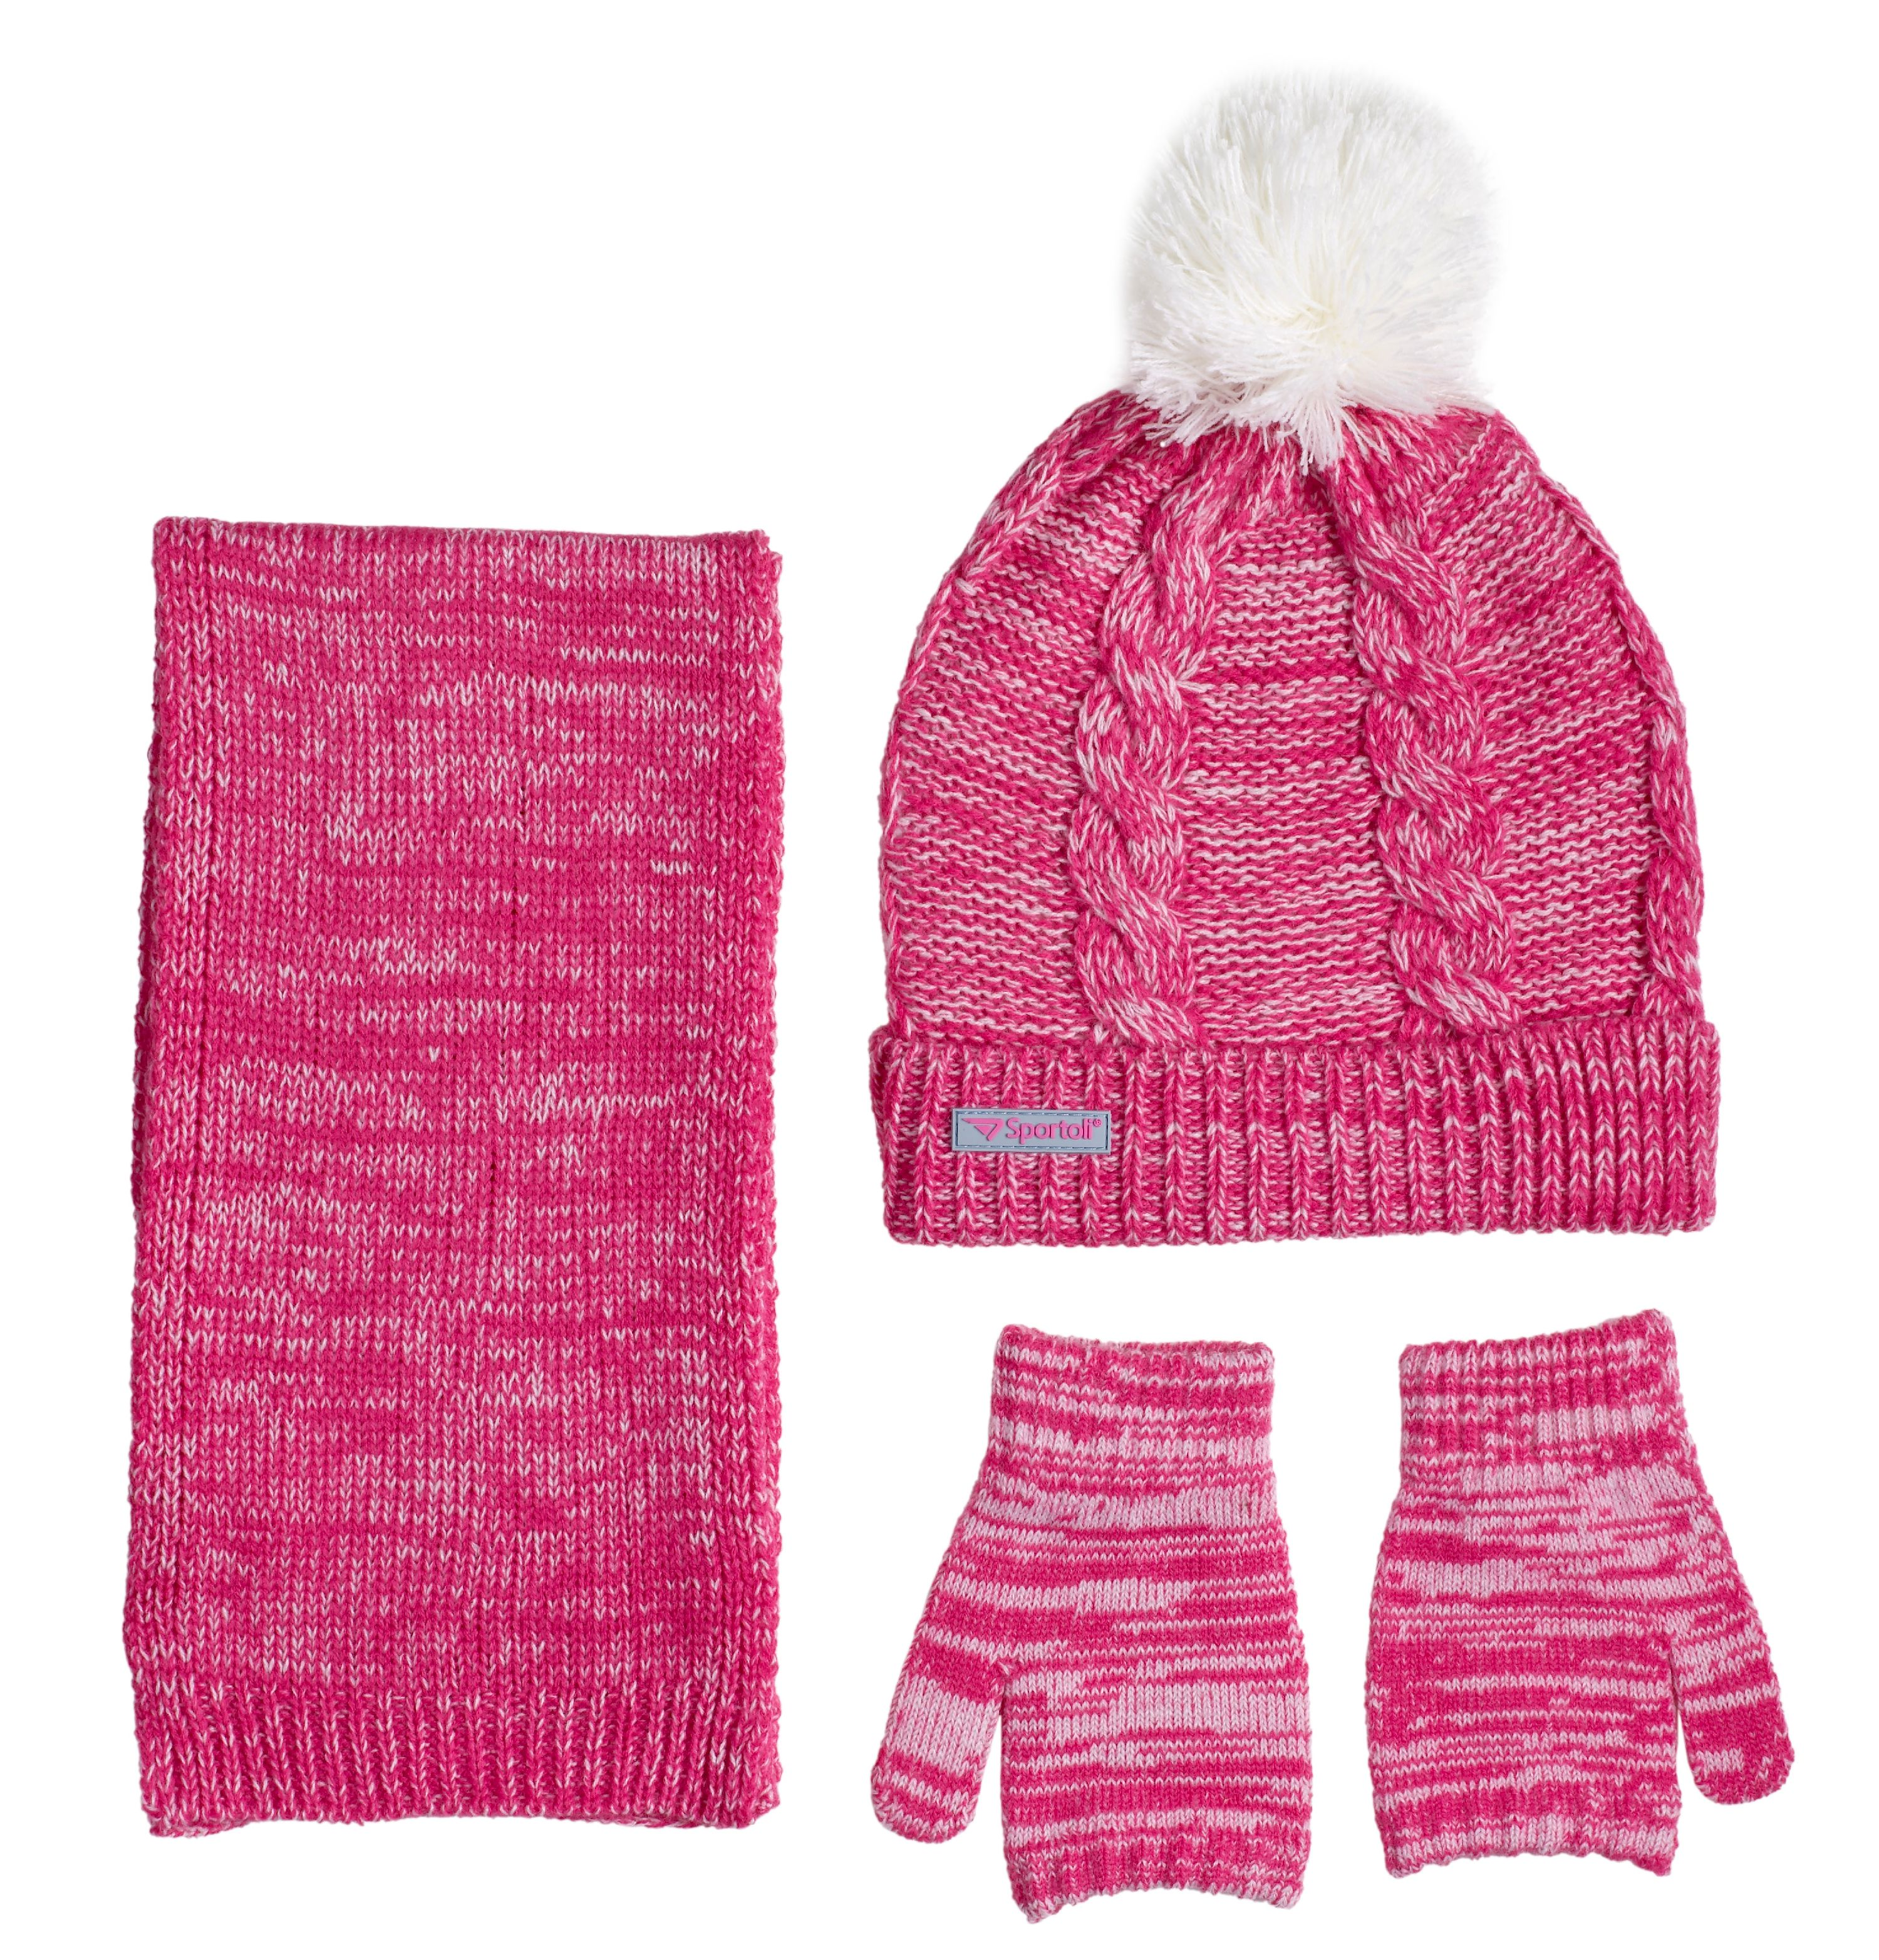 Sportoli Women/'s Girls/' kids 3-Piece Cable Knit Cold Weather Set Hat Scarf Glove